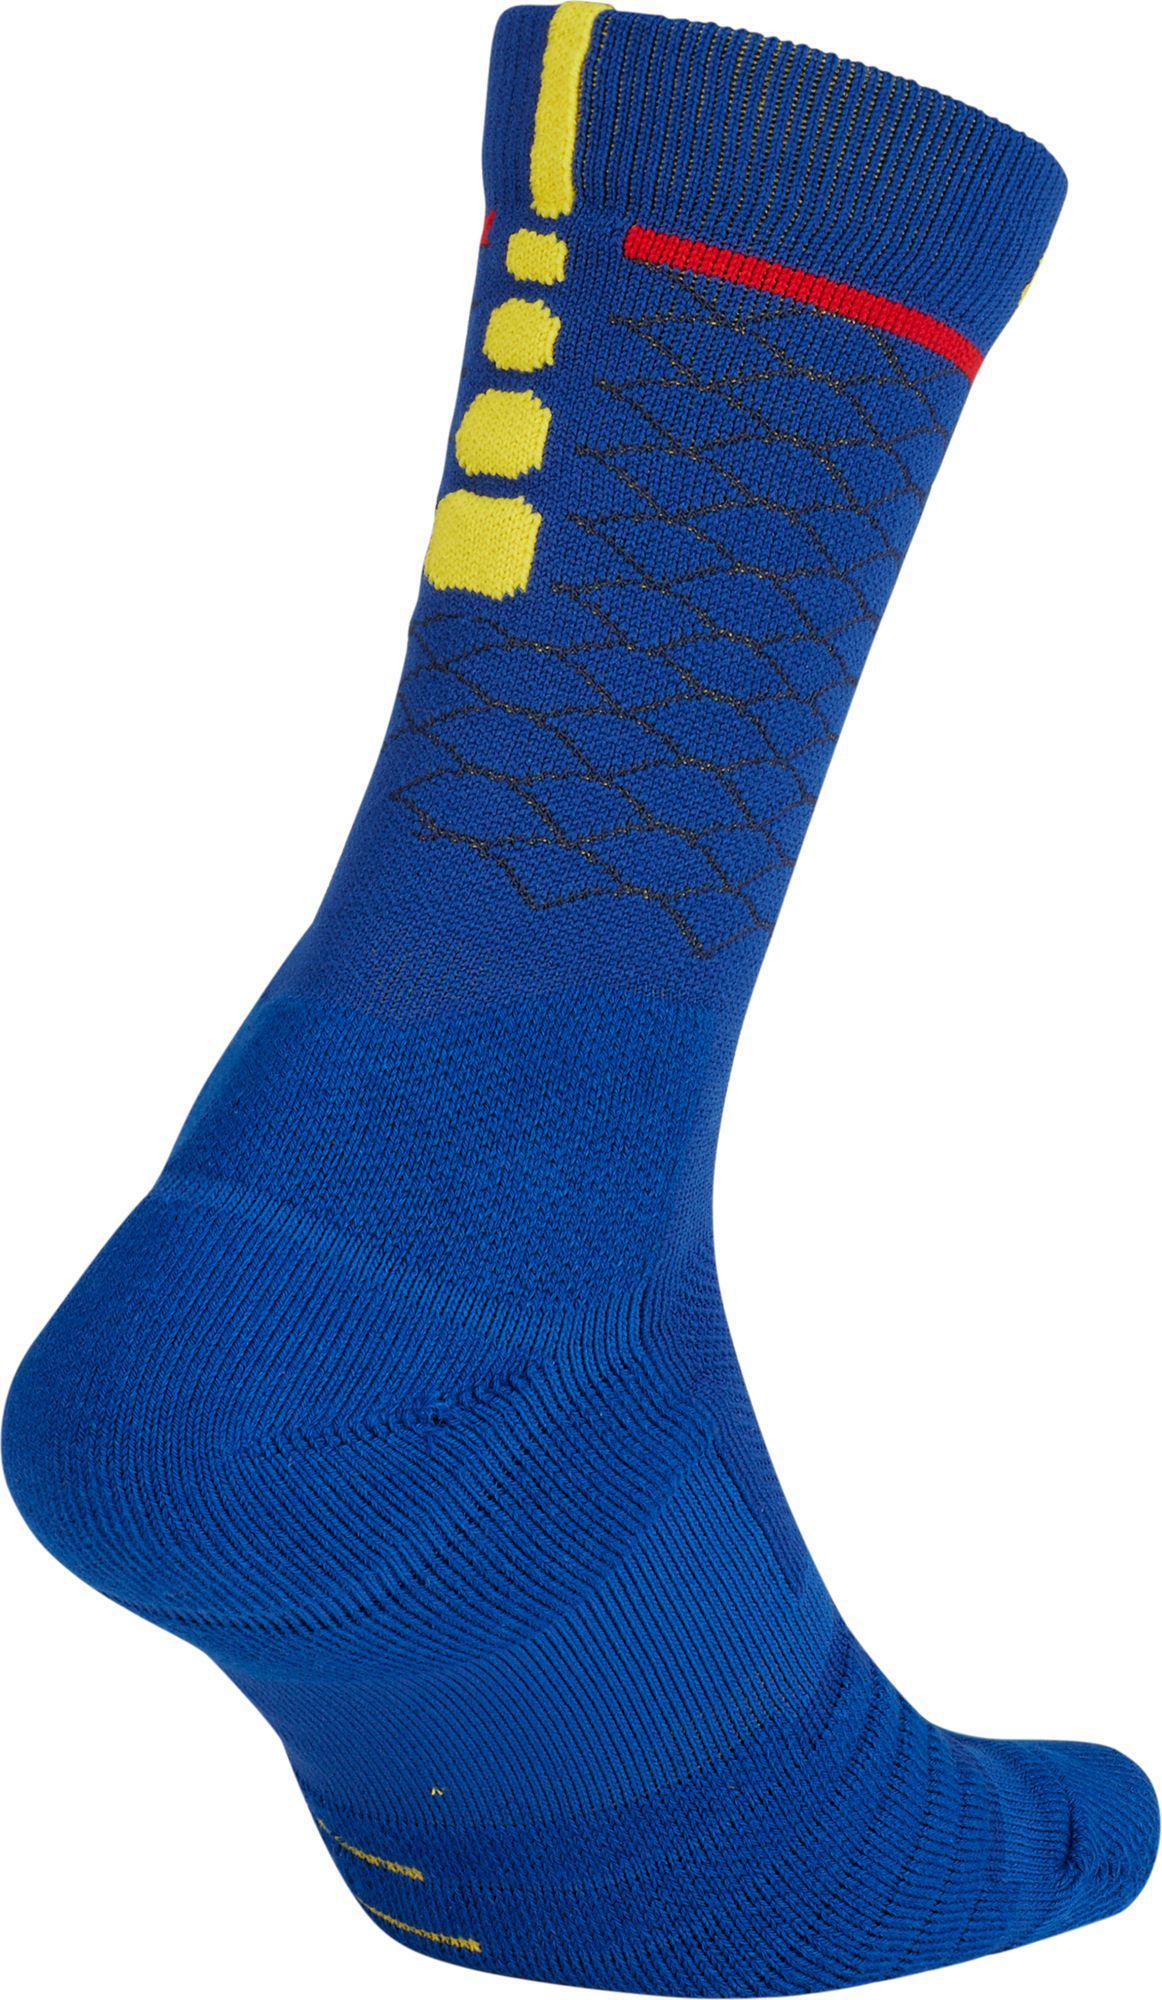 Nike - Blue Golden State Warriors City Edition Elite Quick Nba Crew Socks  for Men -. View fullscreen 2c748fd4e